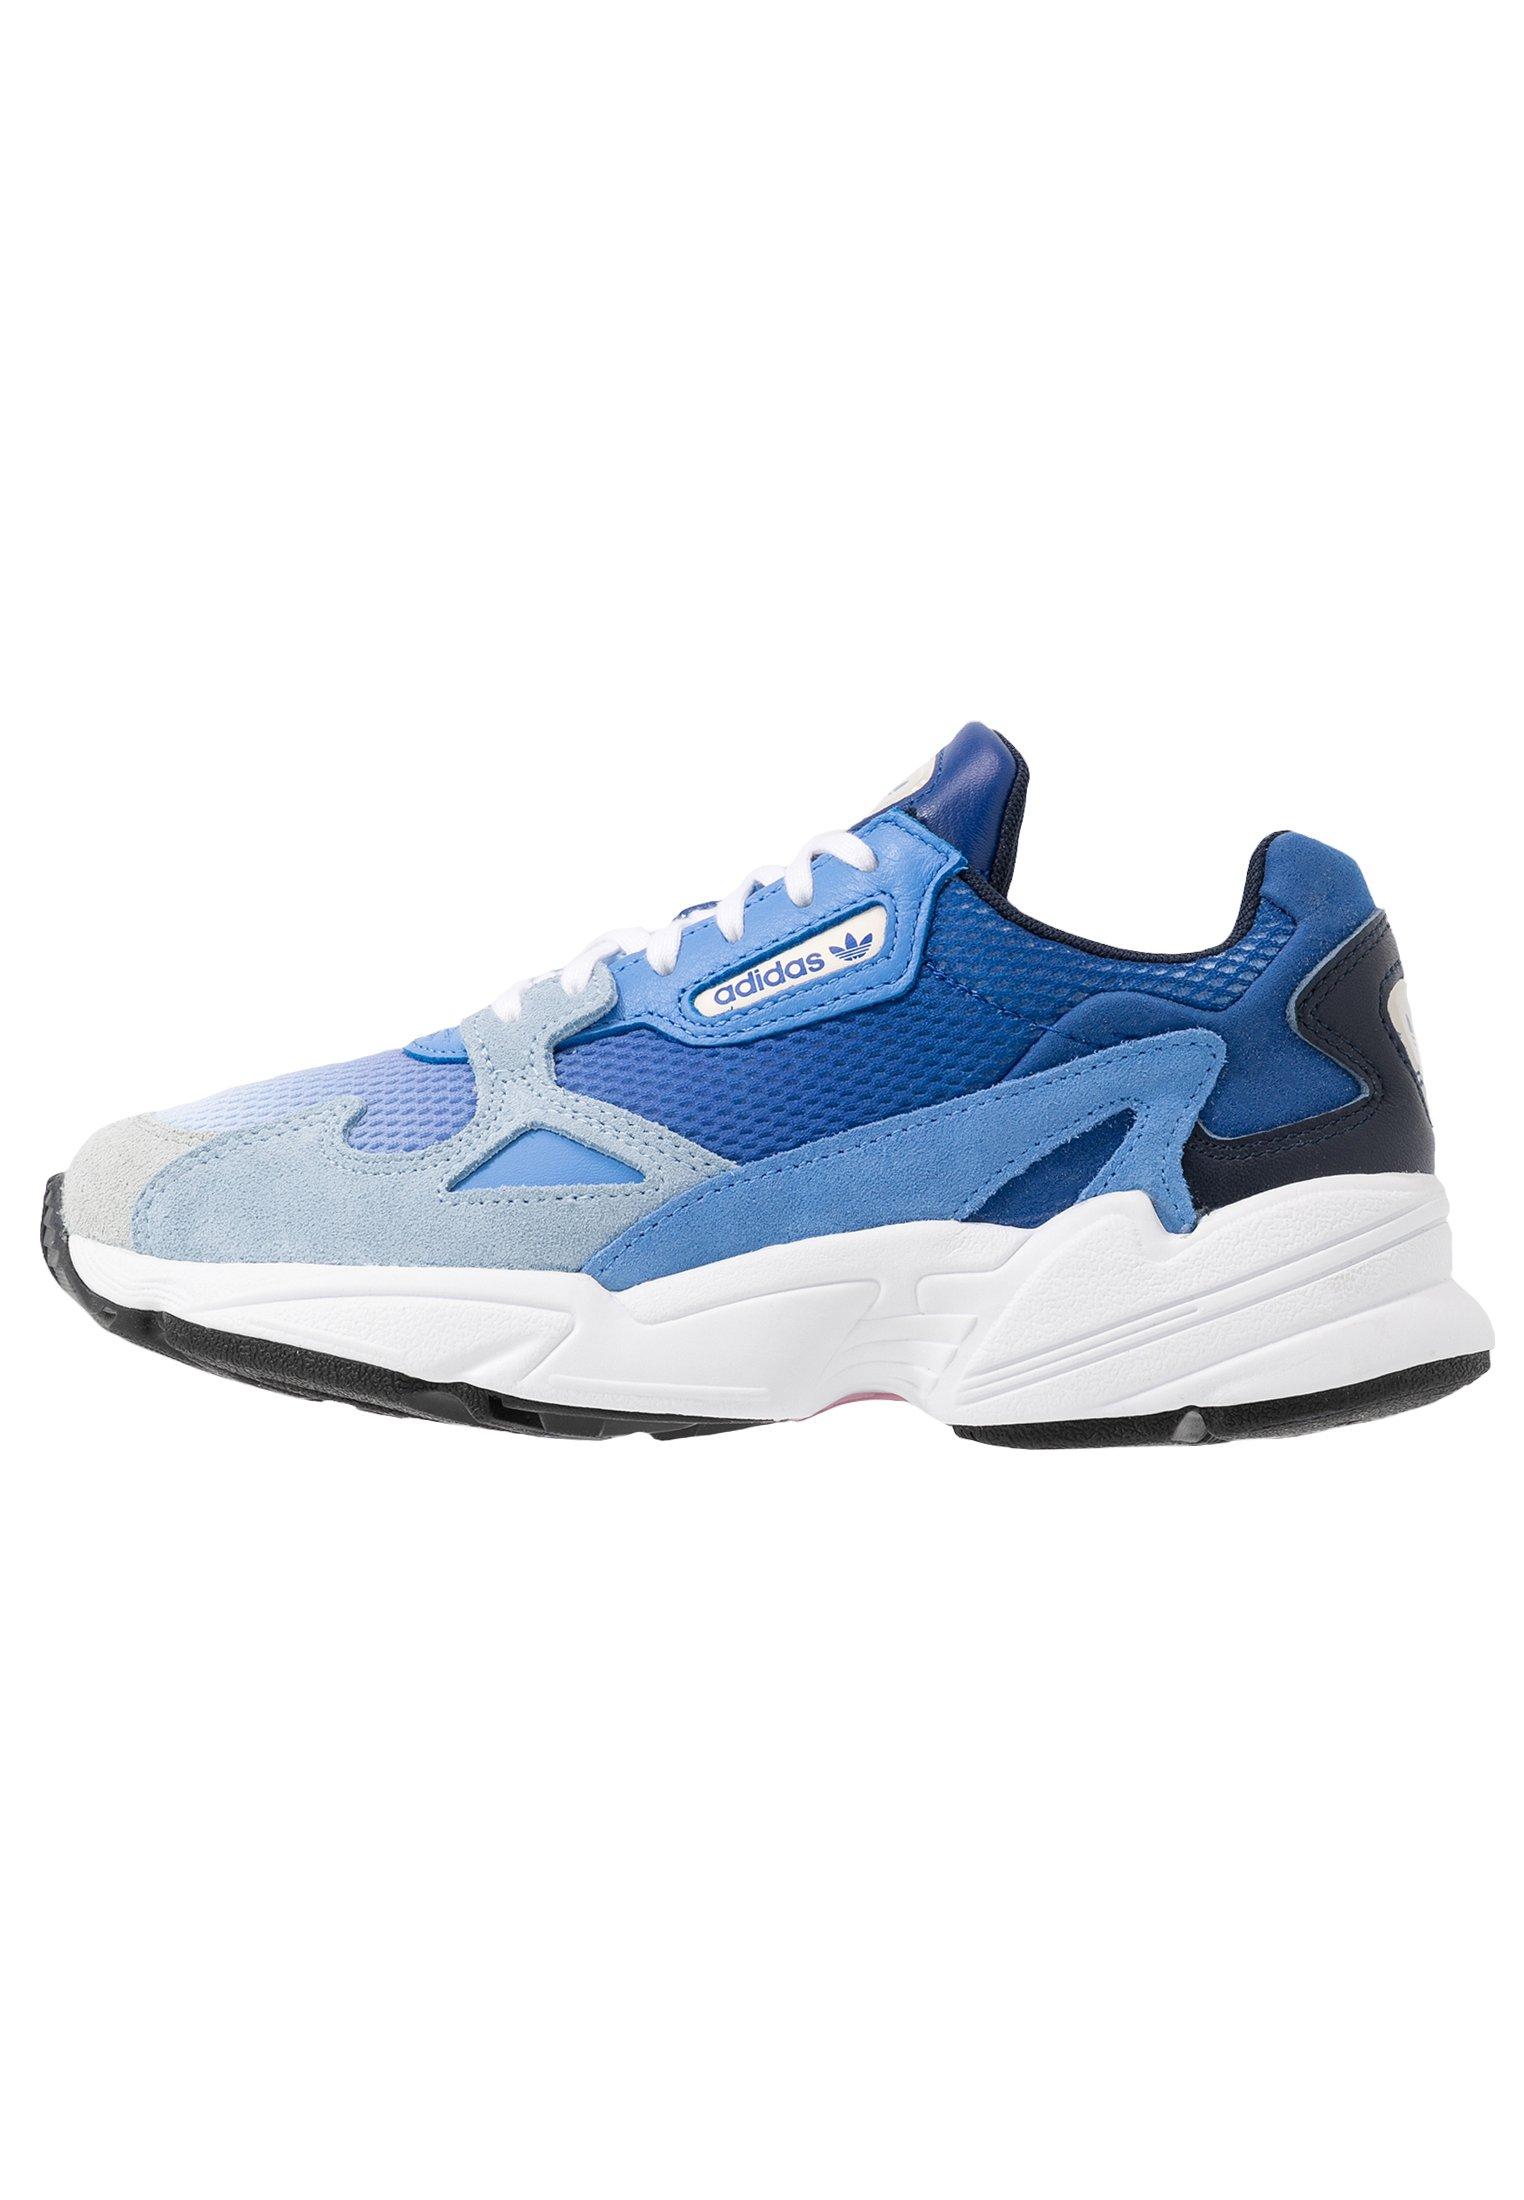 Adidas Originals Falcon - Joggesko Blue Tint/glow Blue/real